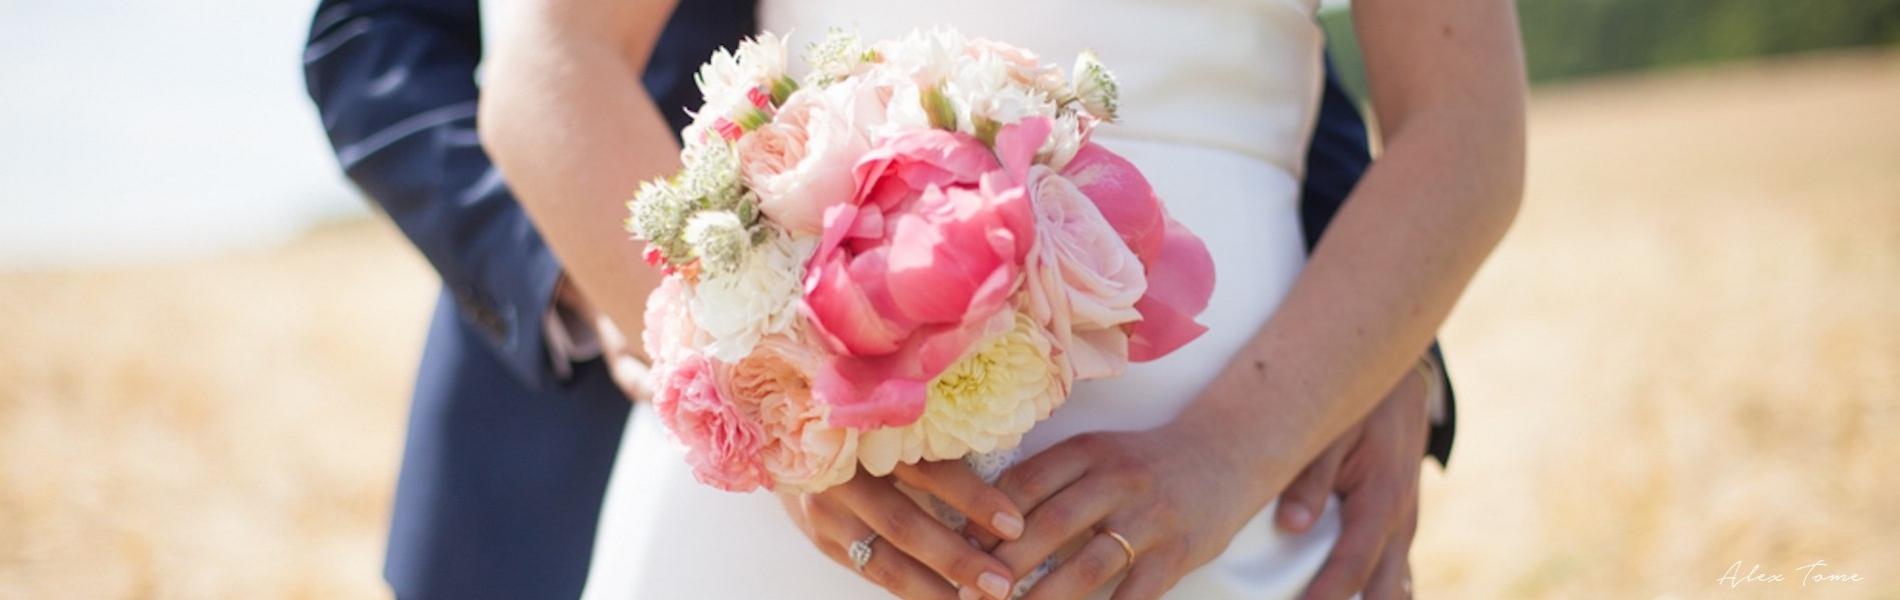 header16_mariage champetre – 1